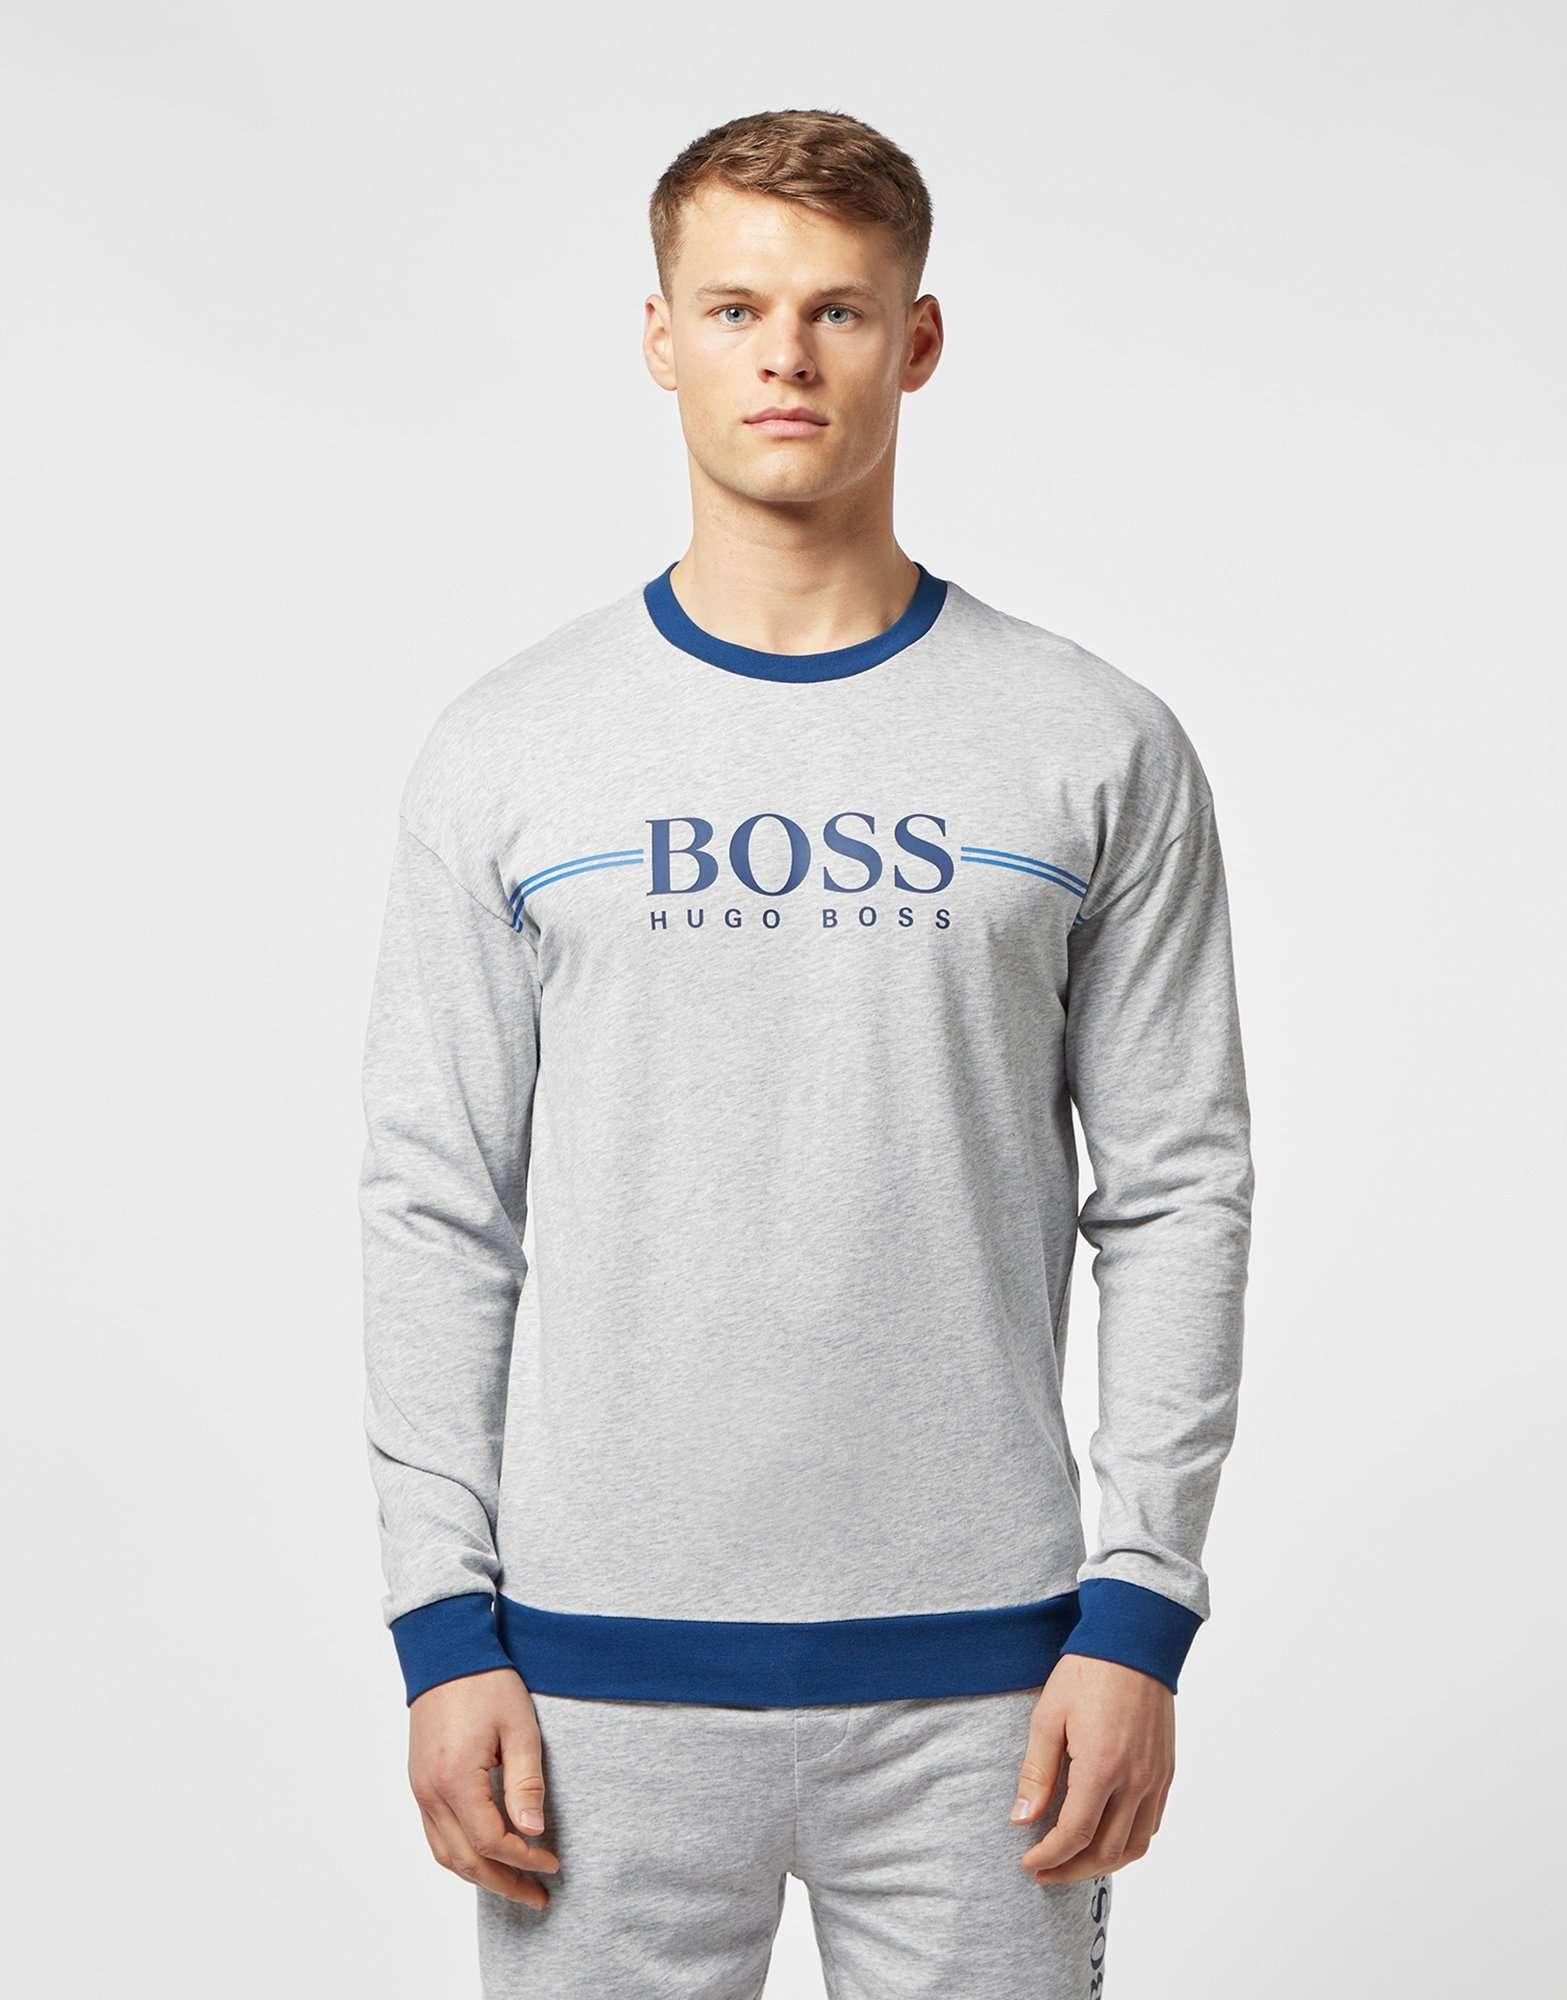 BOSS Authentic Crew Sweatshirt